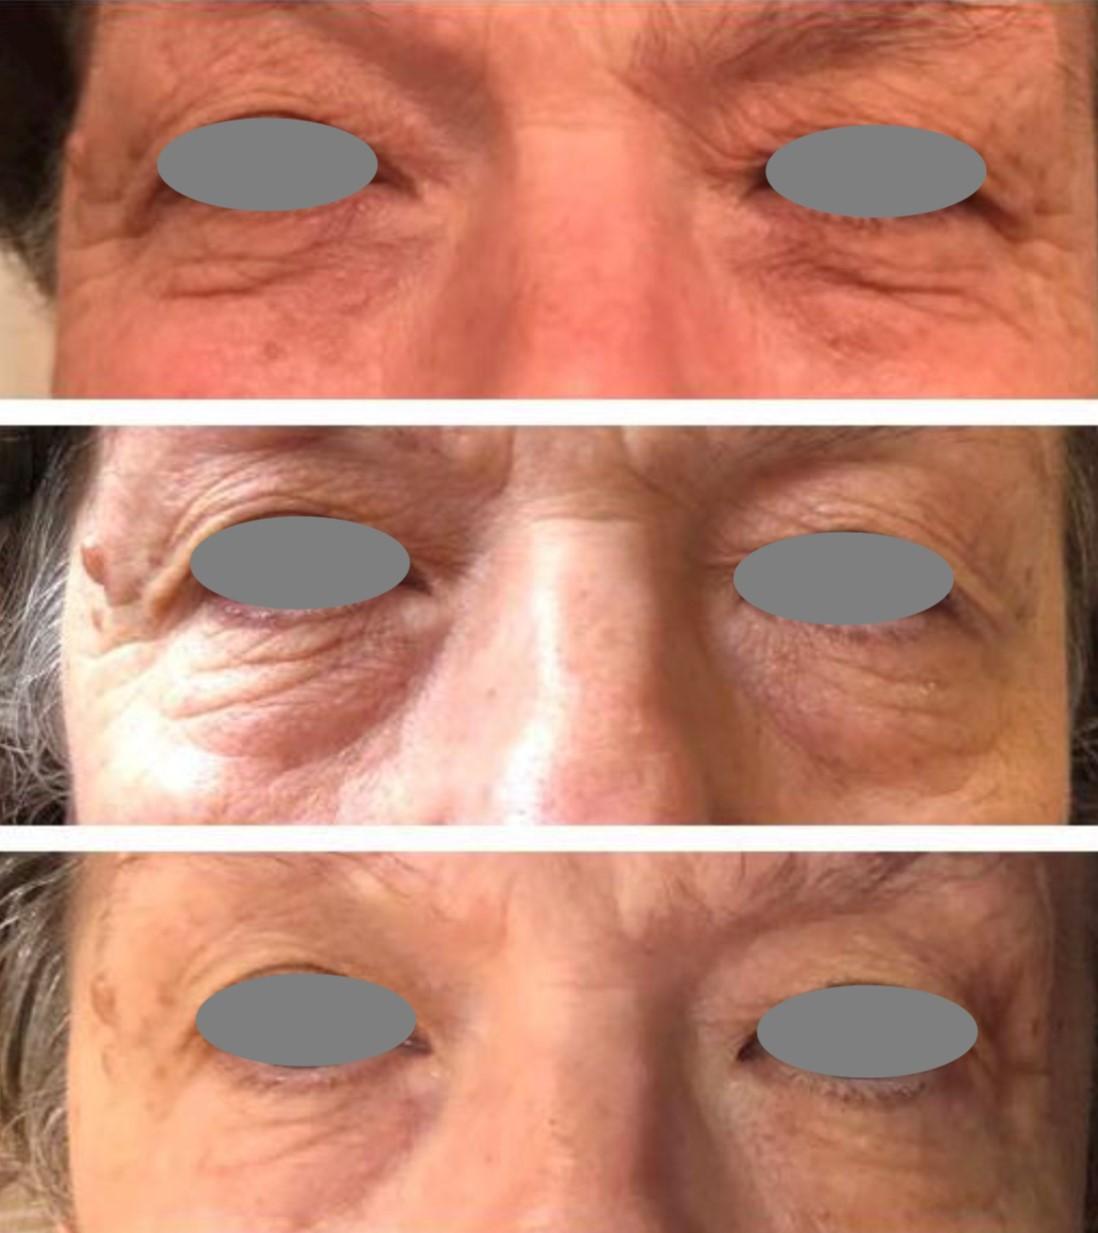 Mezotix before and after peri-orbital treatment